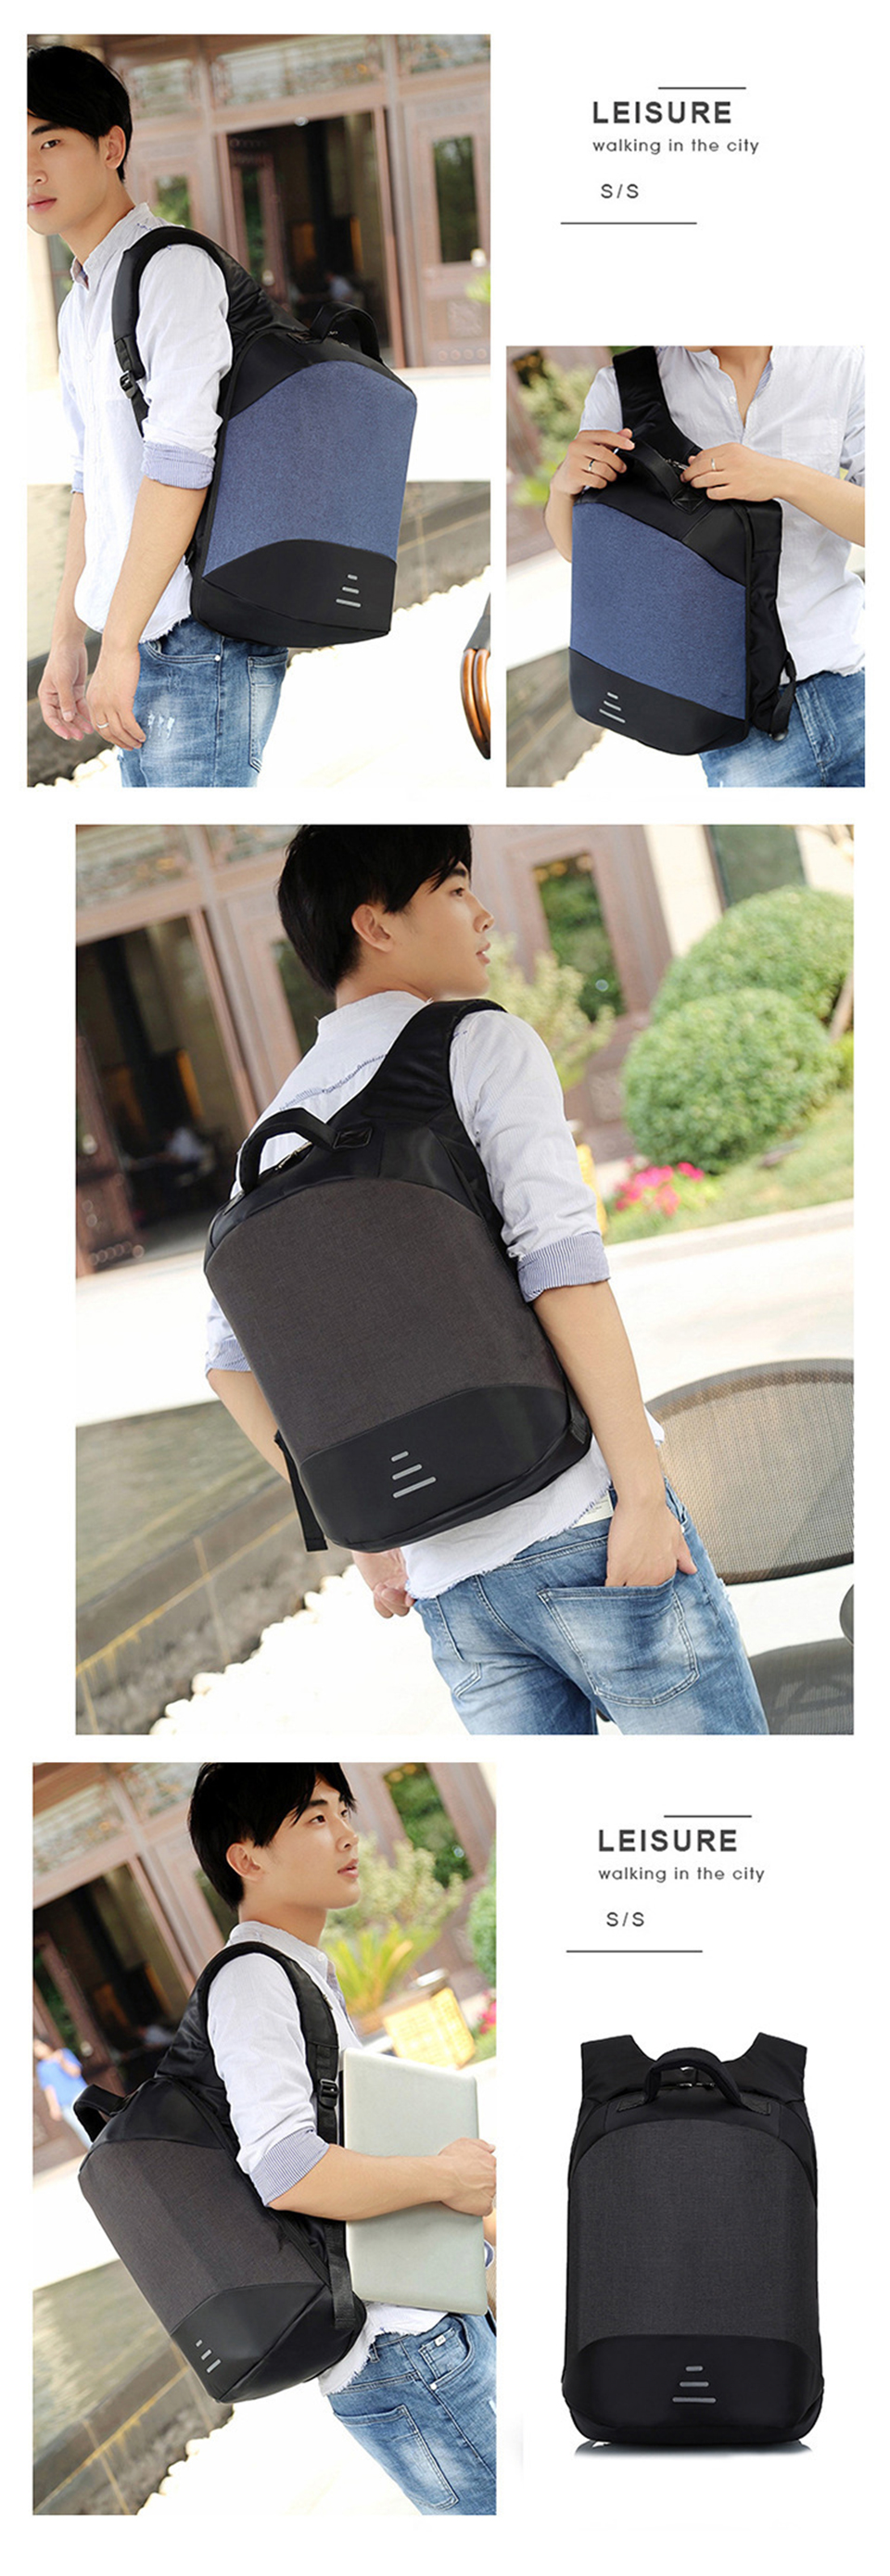 17''-Anti-theft-Backpack-Bag-Mens-Women-Male-Mochila-Outdoor-Travel-Bags-15.6-Inch-Laptop-Backpacks-USB-Charging-Backpacking-Men_15